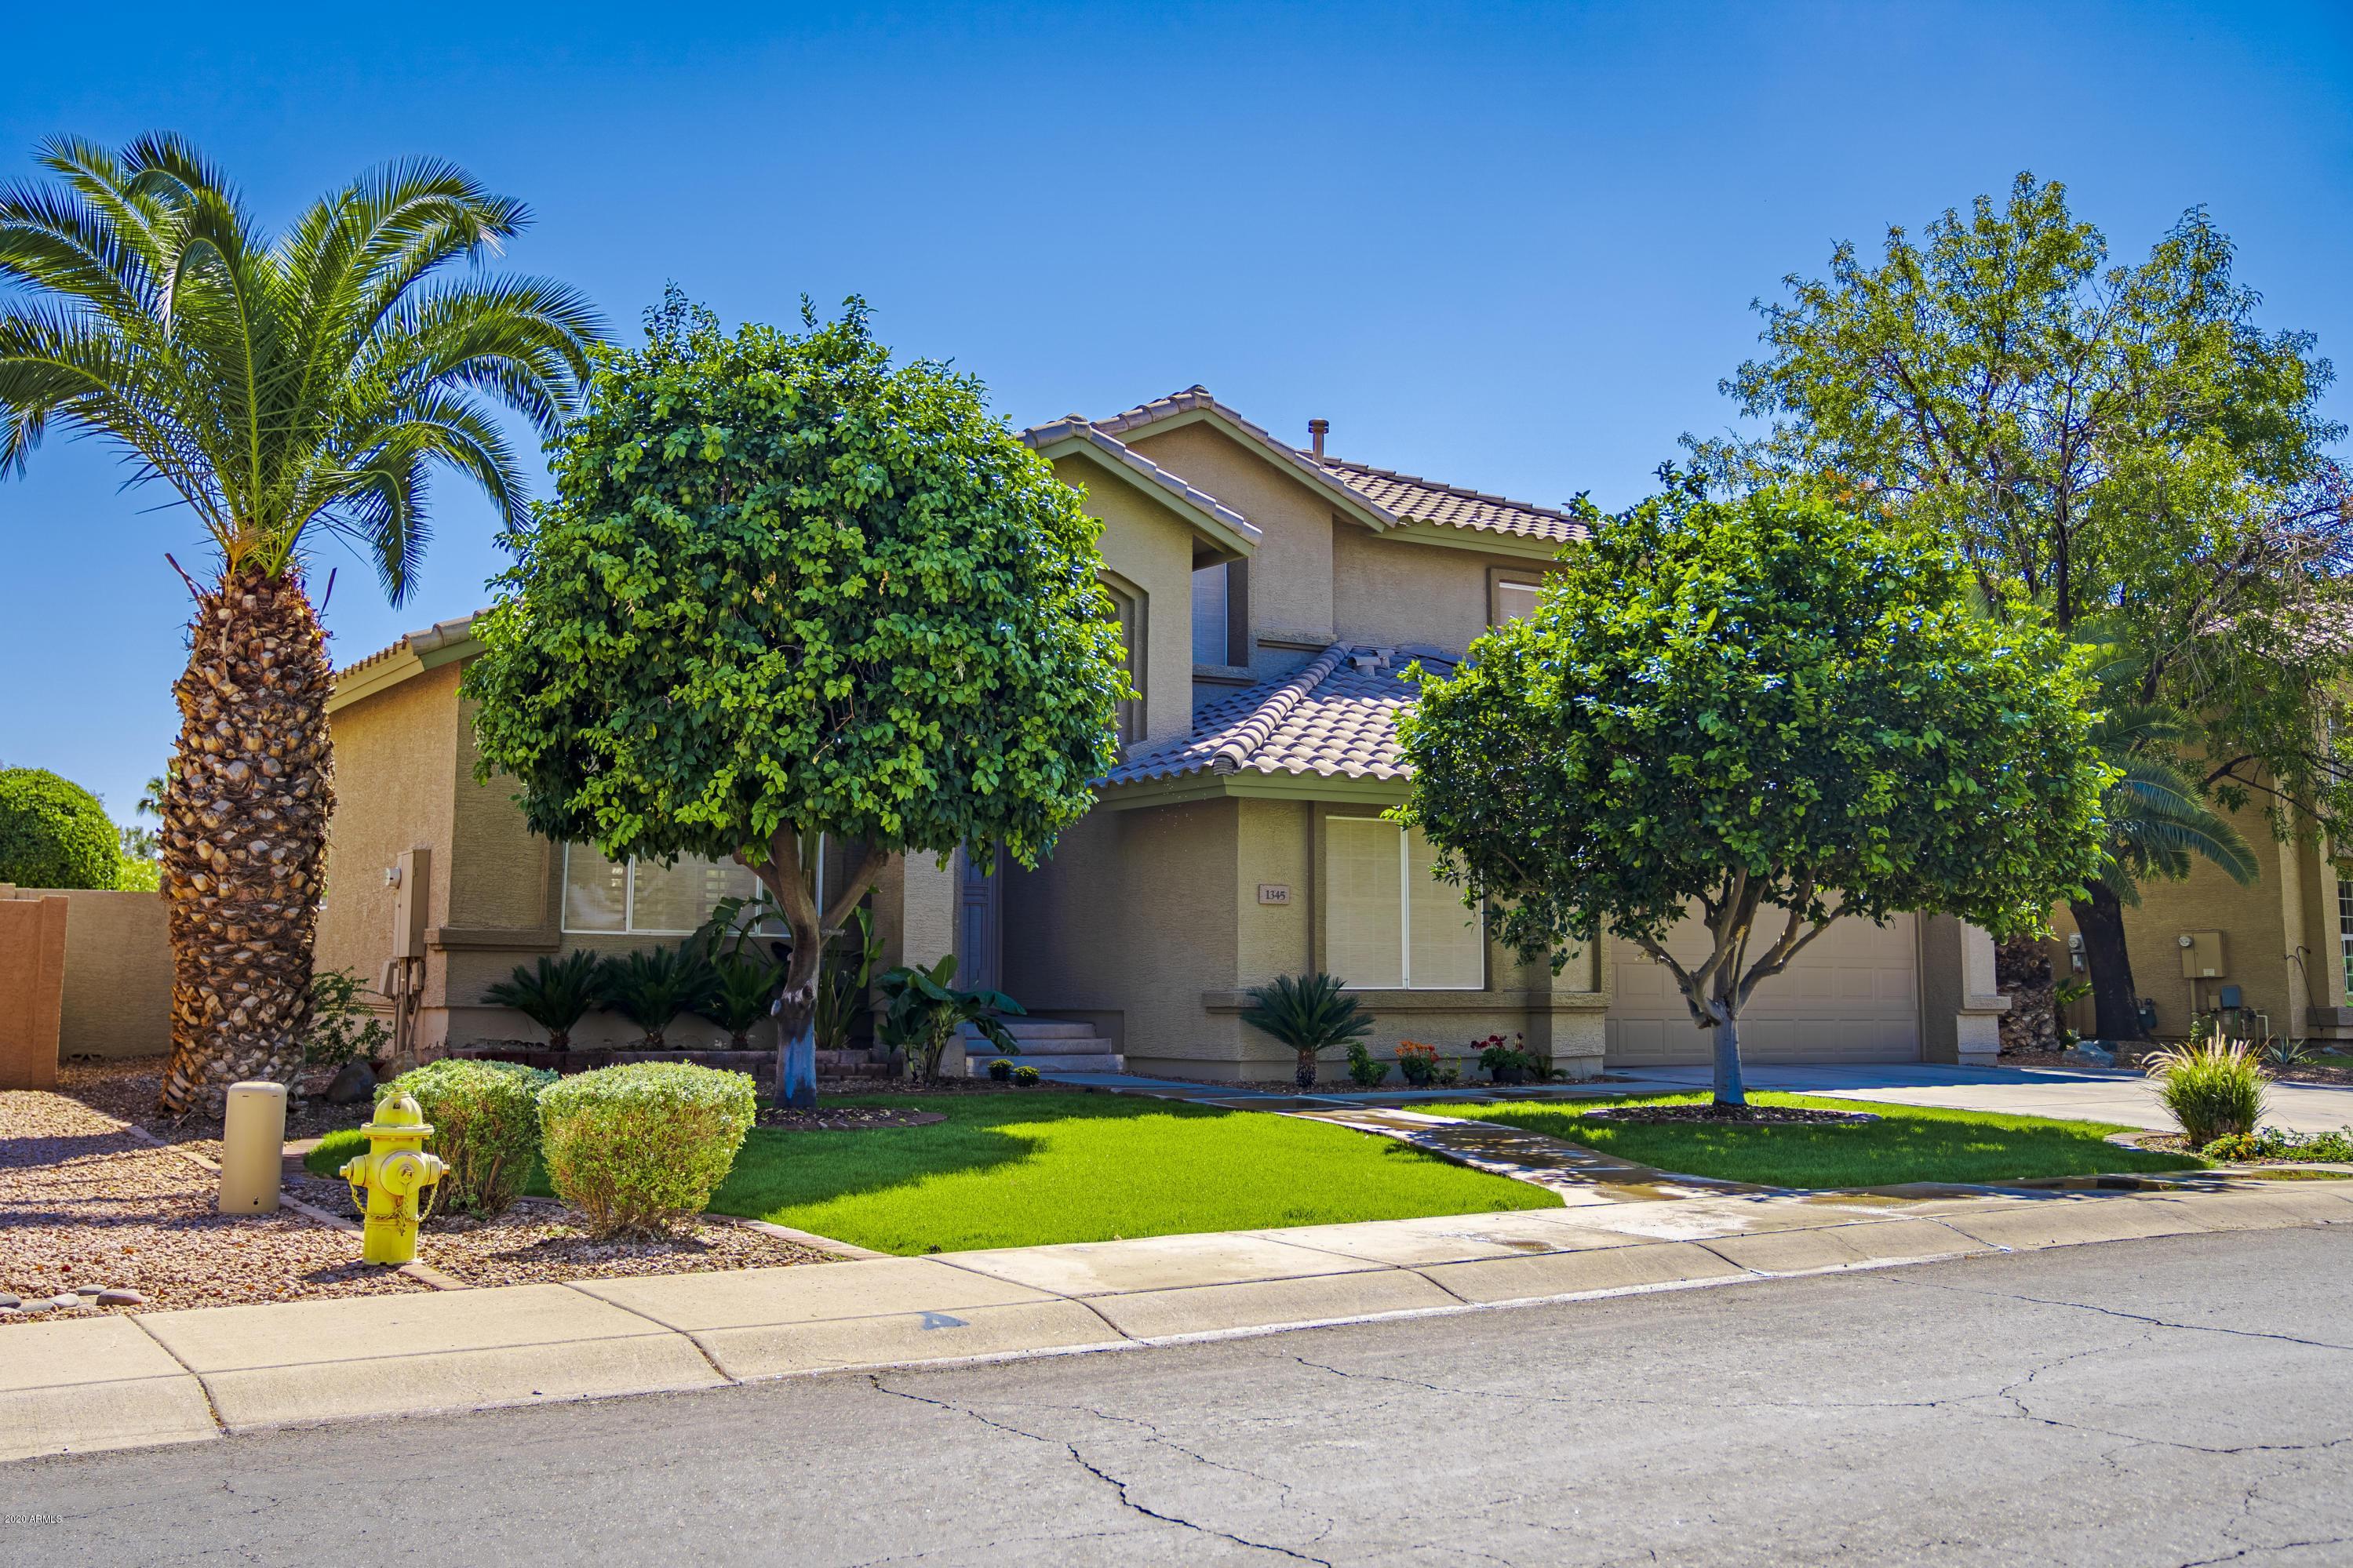 Property Image for 1345 La Arboleta Street